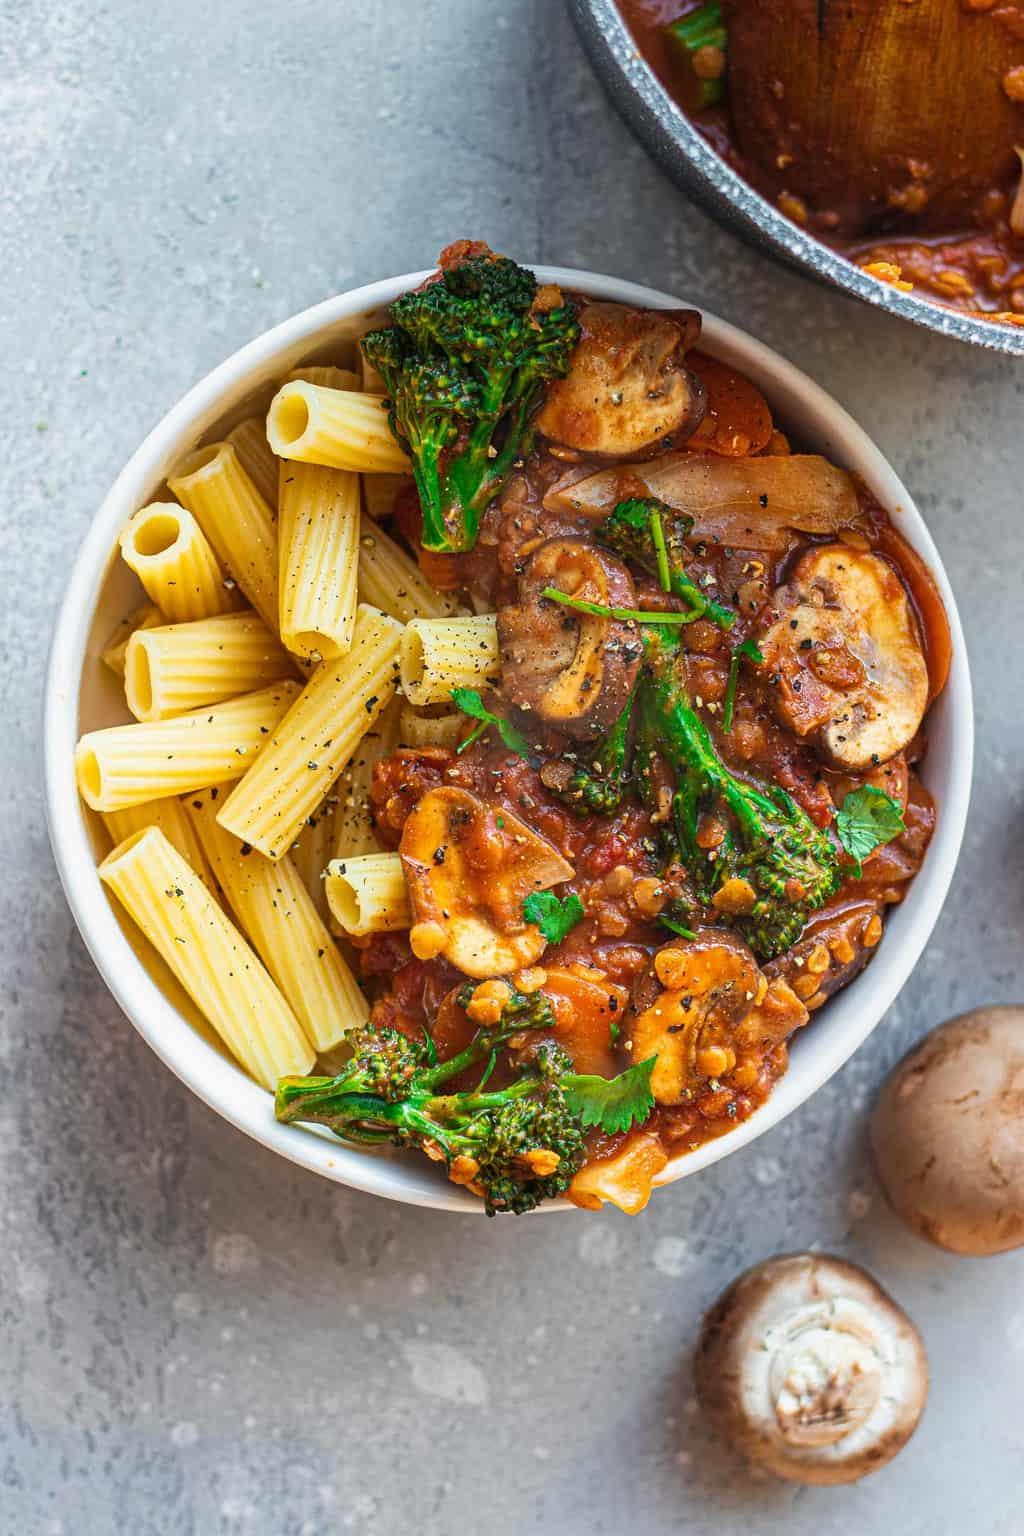 Bowl of vegan lentil pasta sauce with broccoli